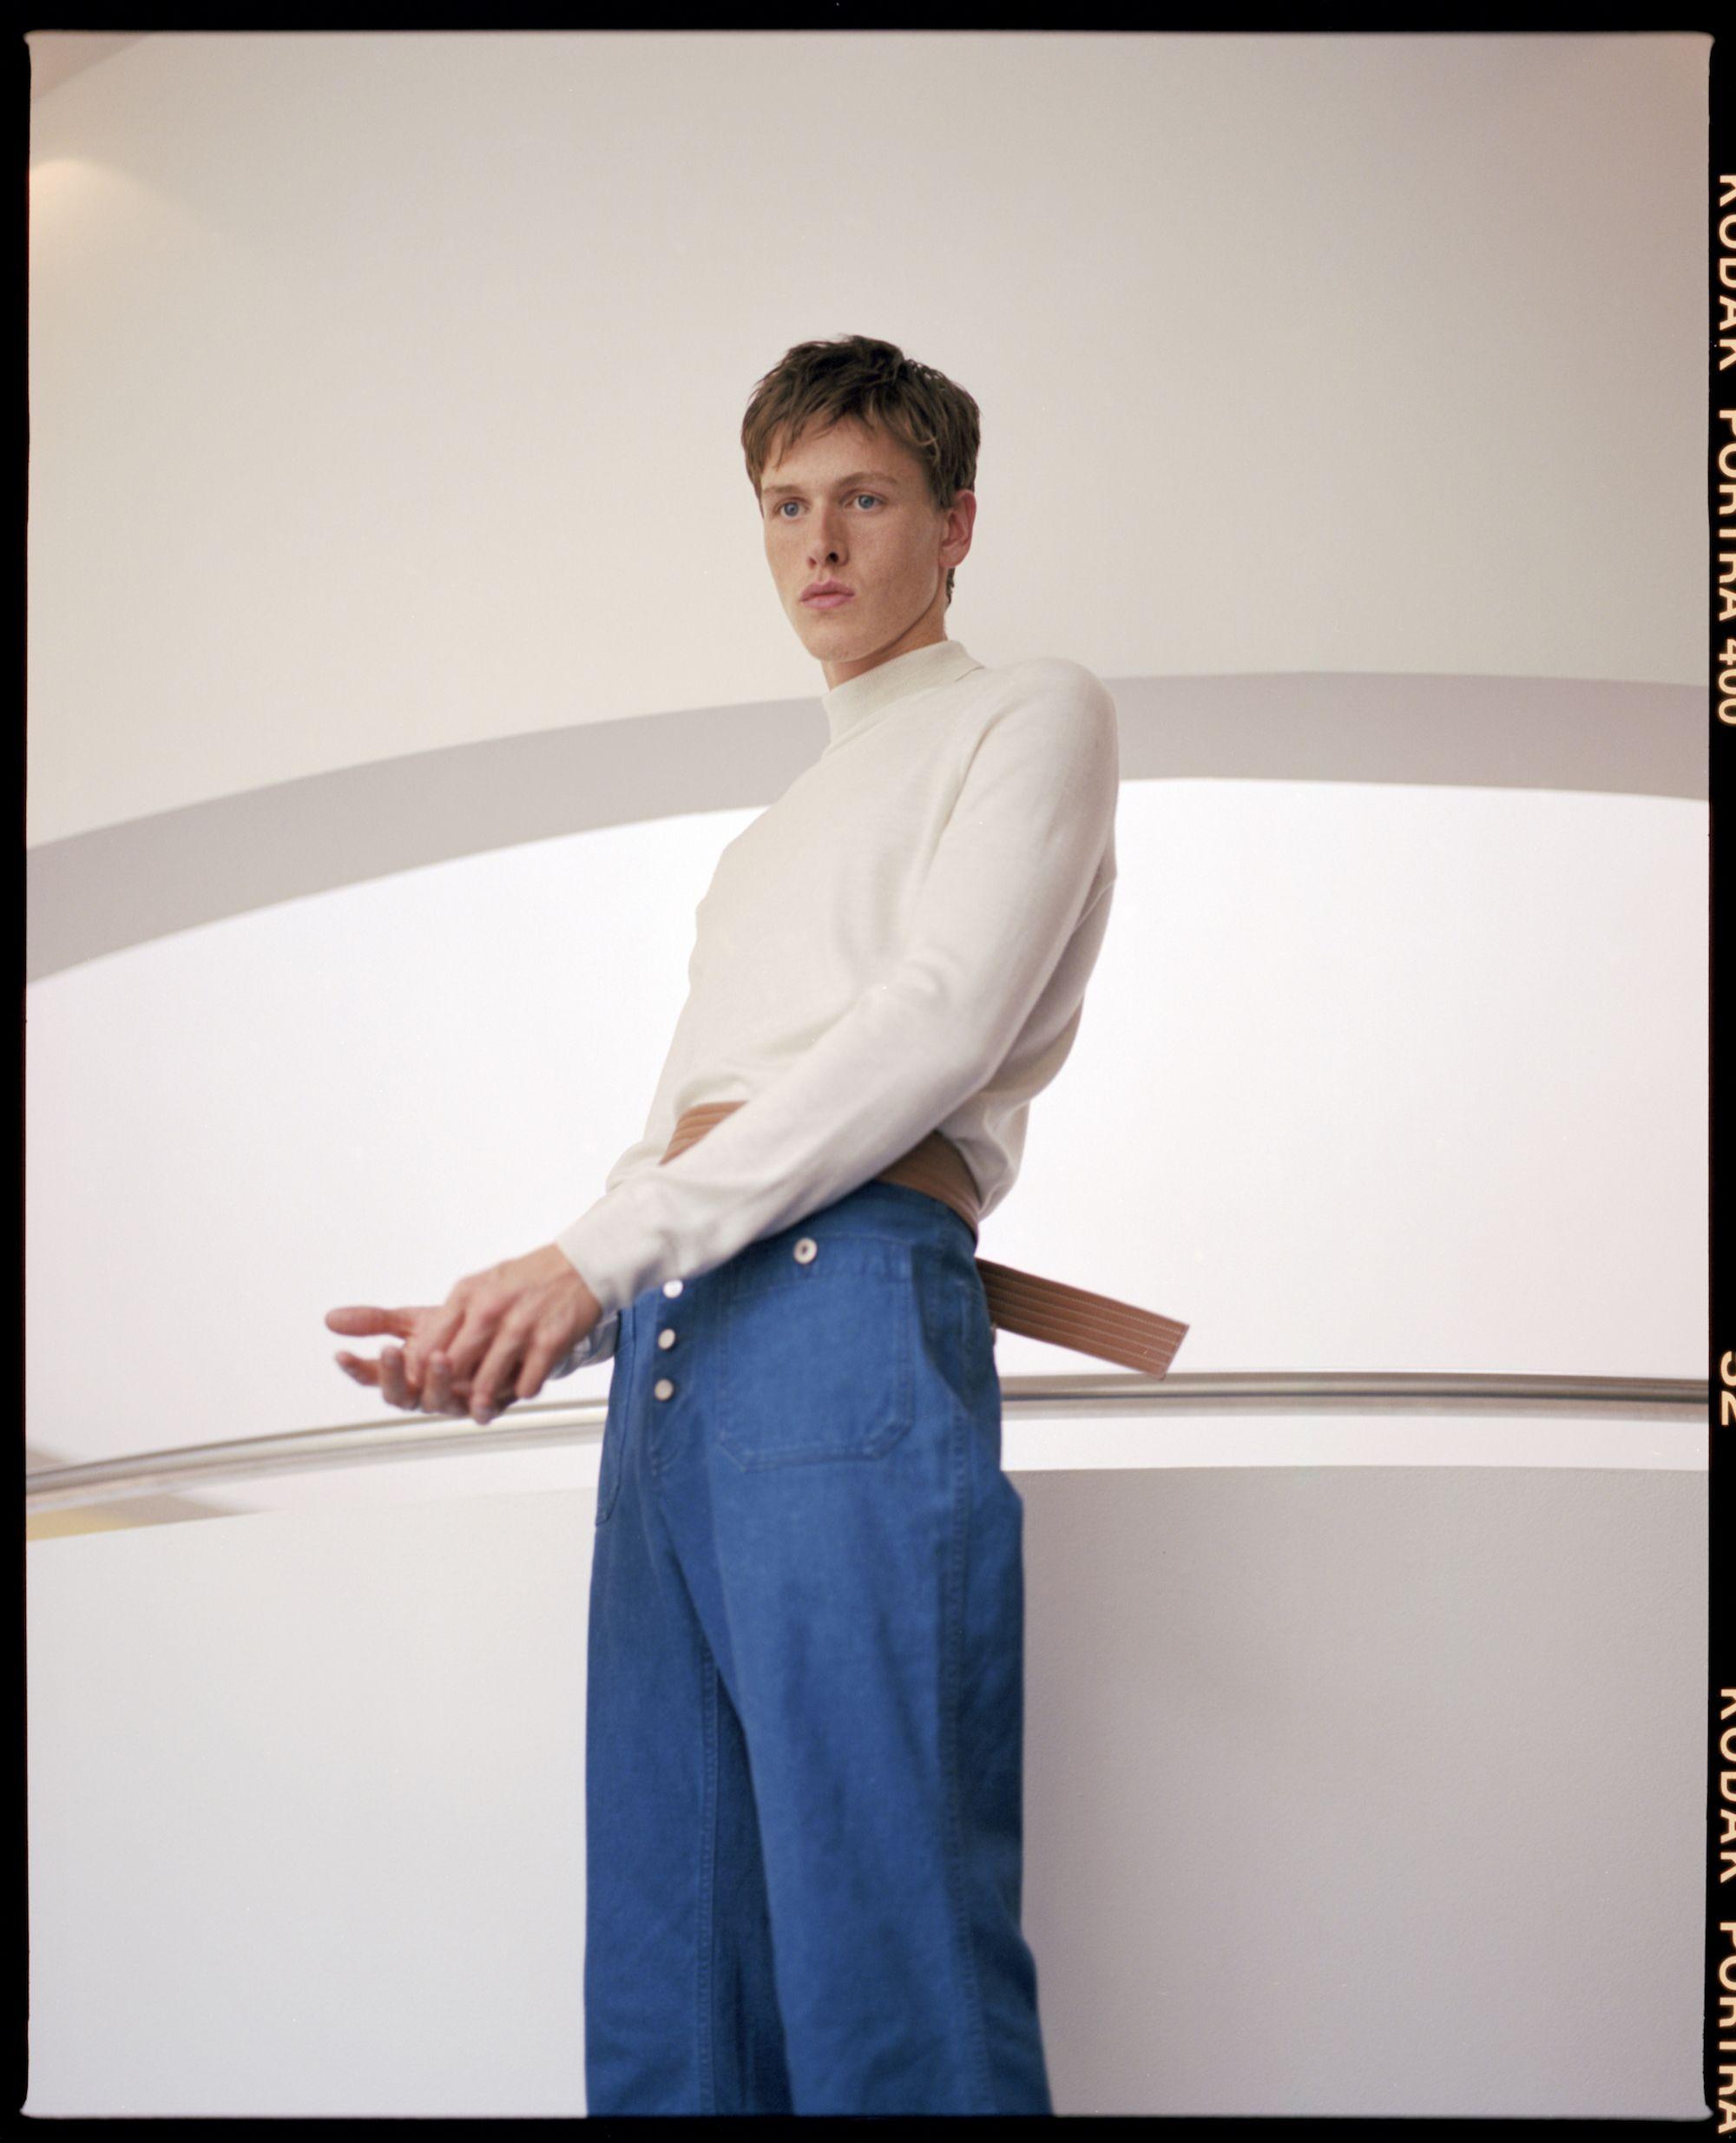 Harris Dickinson Harris dickinson, Men photoshoot